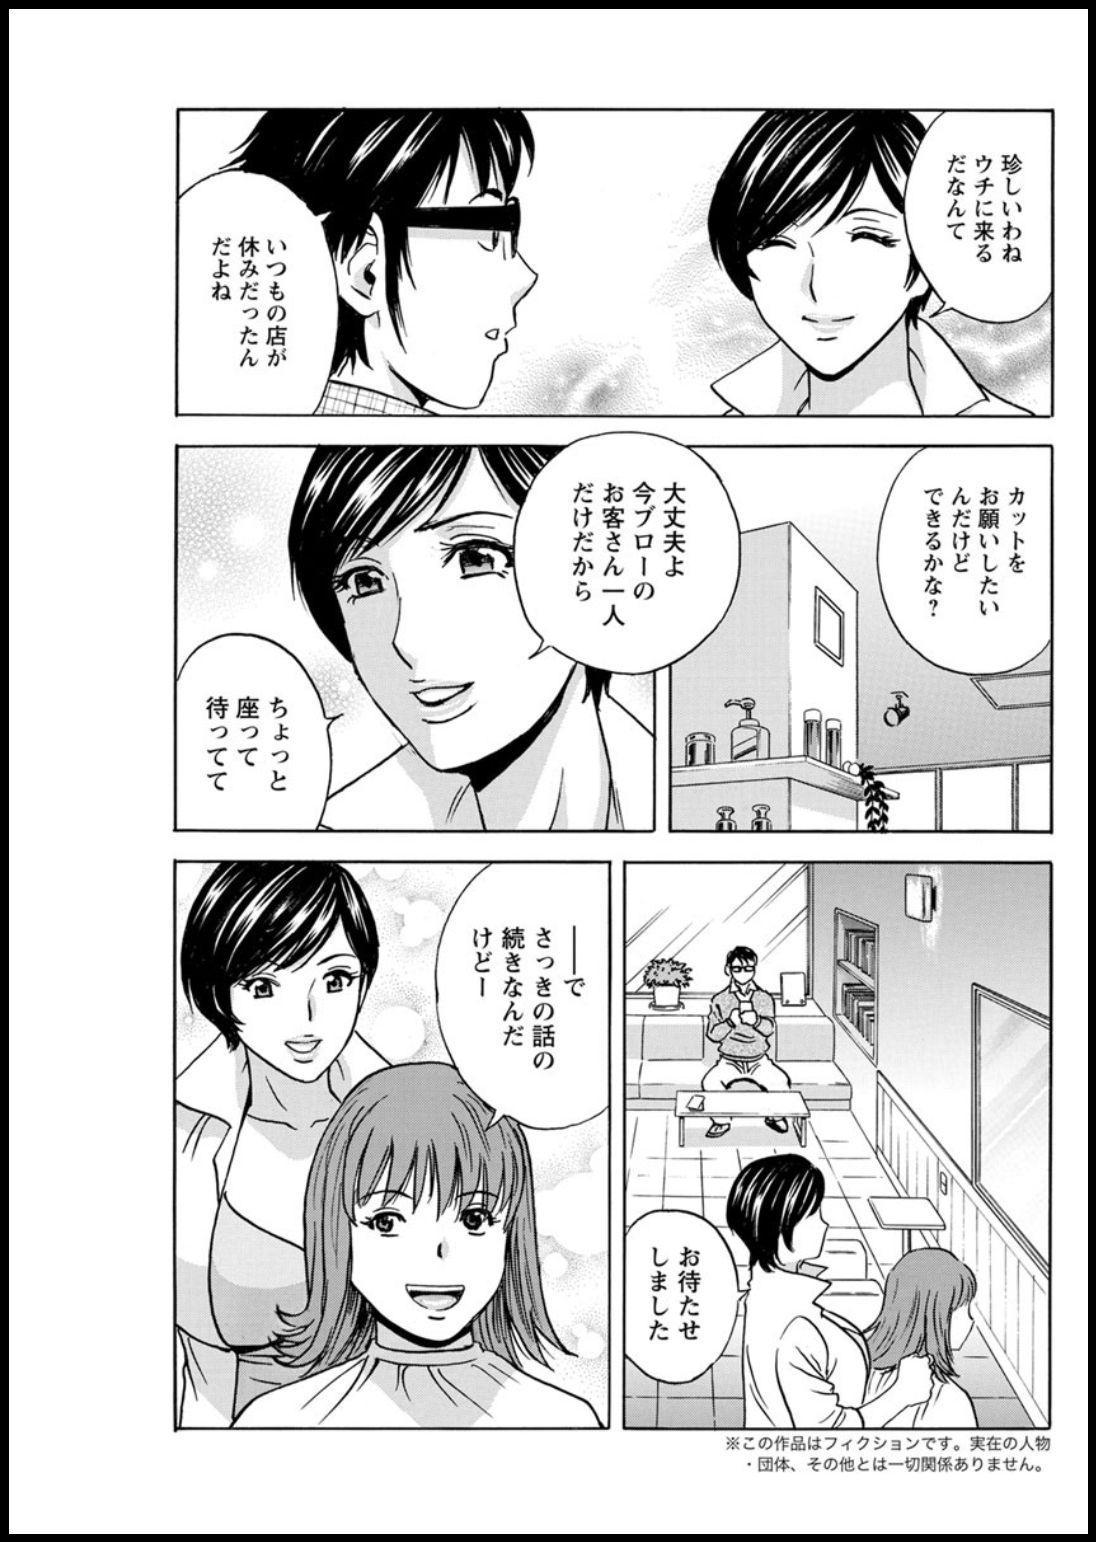 [Hidemaru] Yurase Bikyonyuu! Hataraku J-Cup Ch. 1-5 [Digital] 76